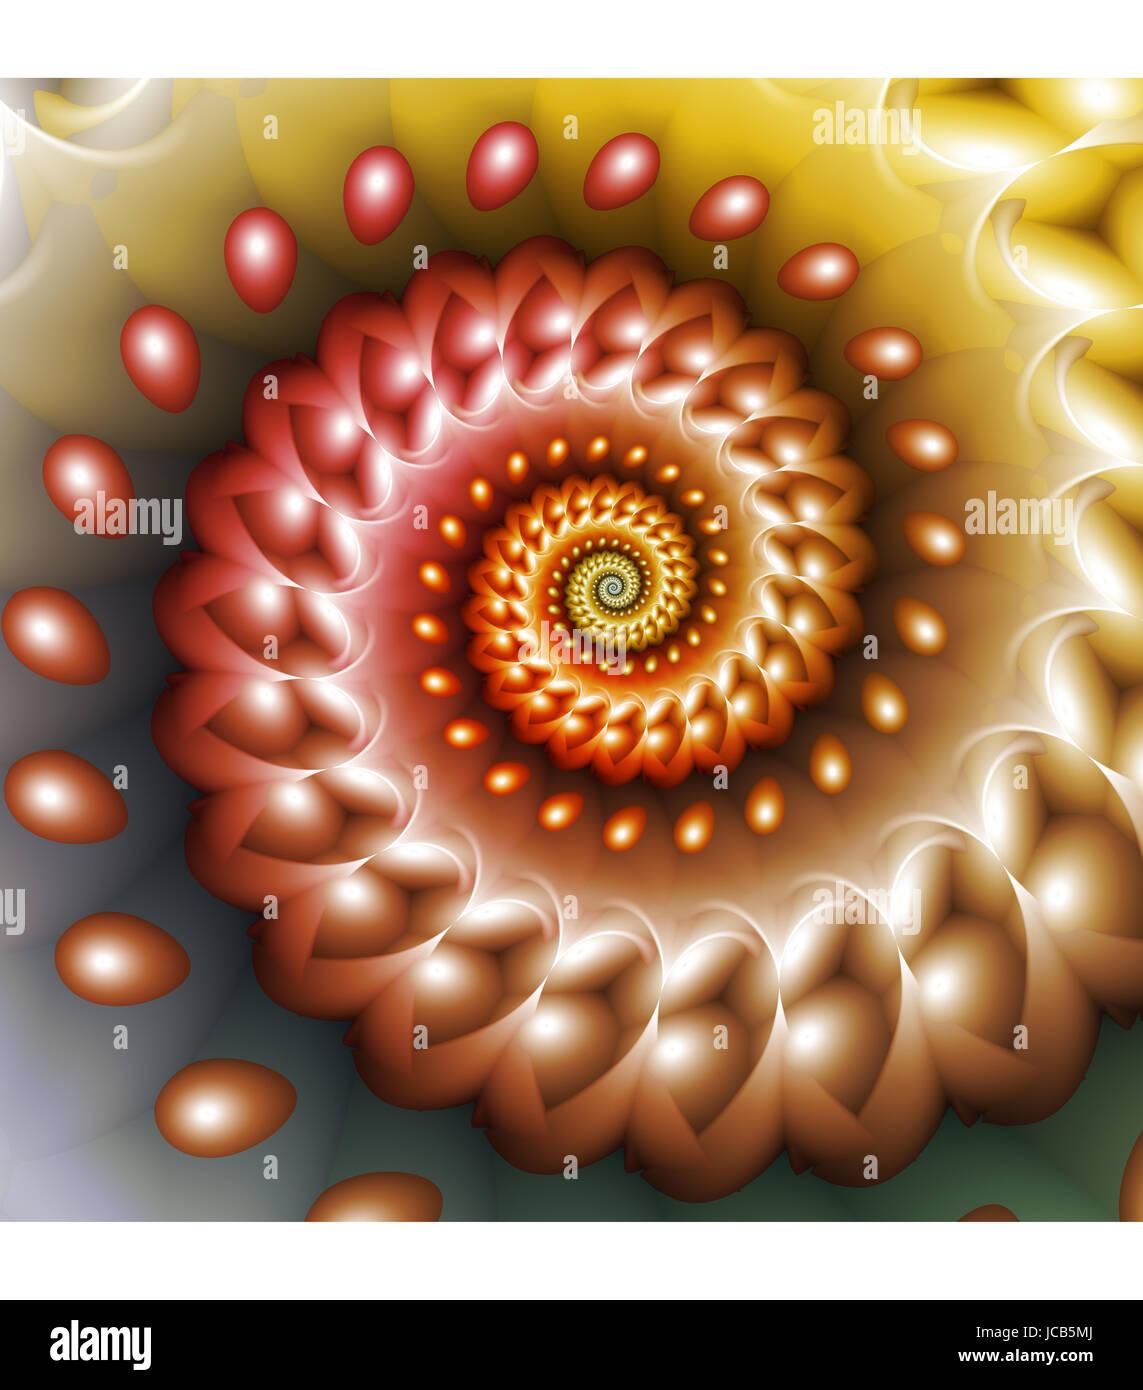 Spiraling abstract fractal design Stock Photo